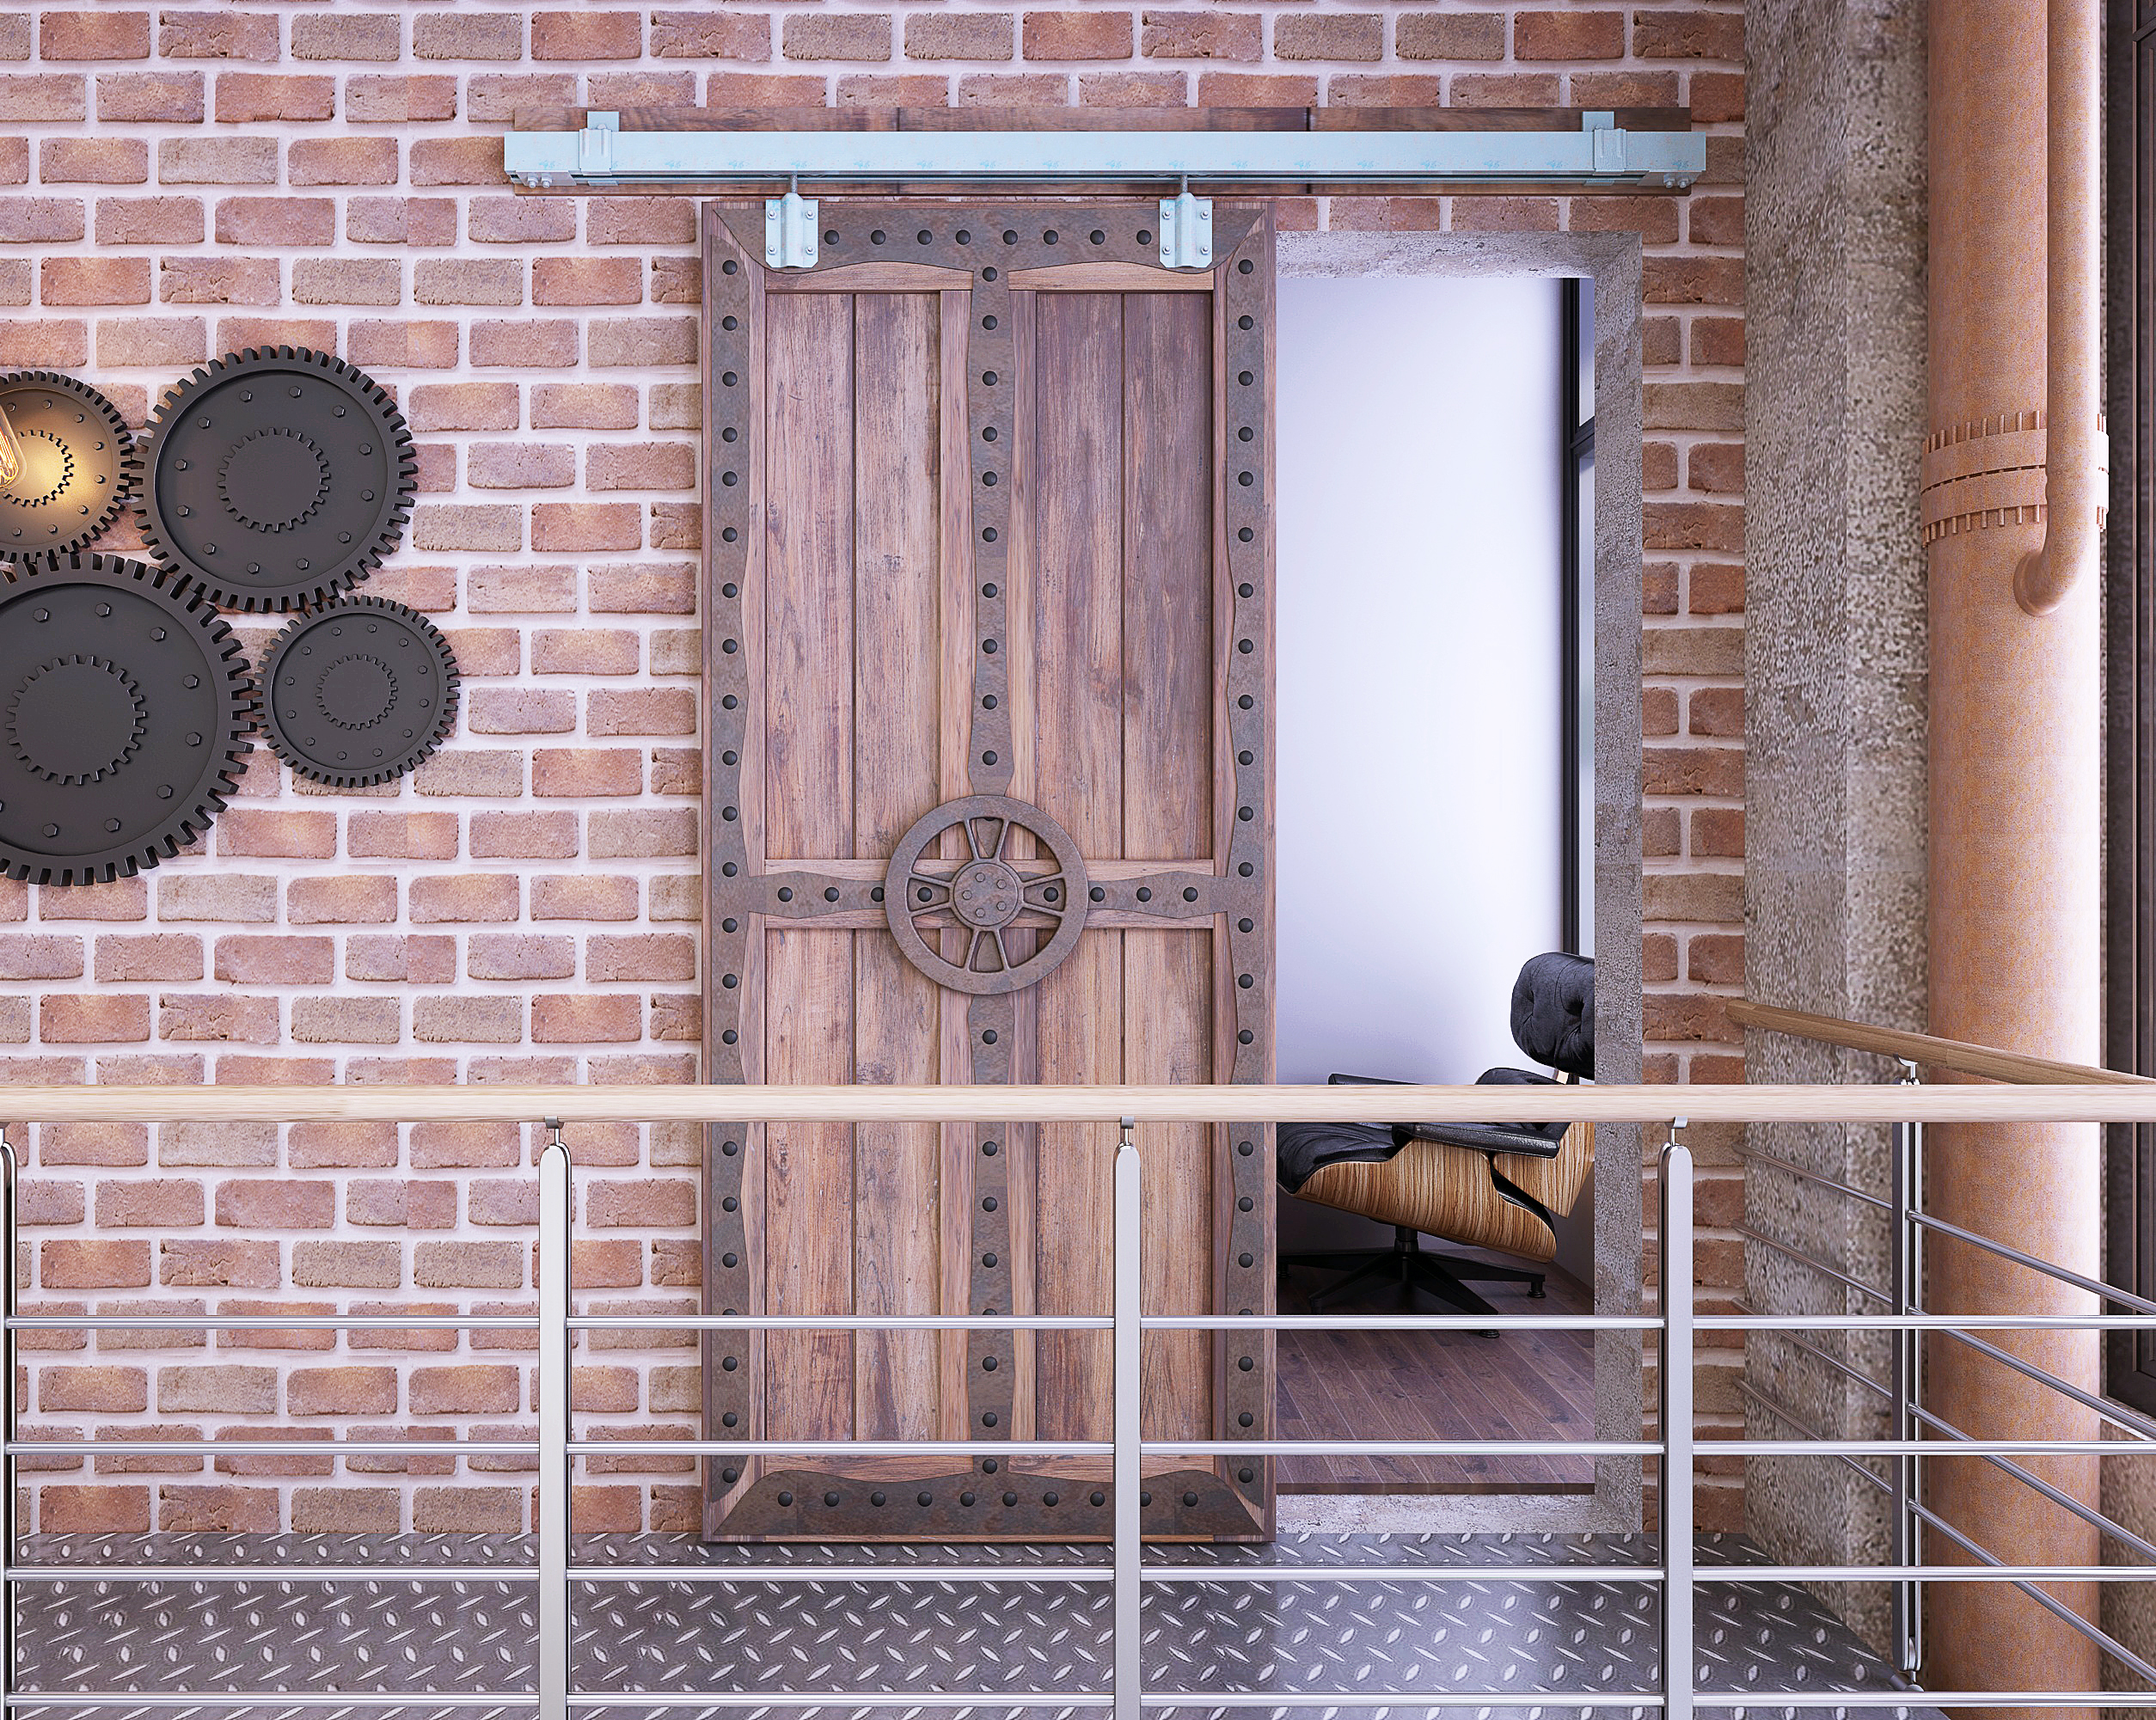 DIYHD matière première galvanisé boîte de ruban piste porte de grange porte intérieure piste Harddware pour porte de grange extérieure